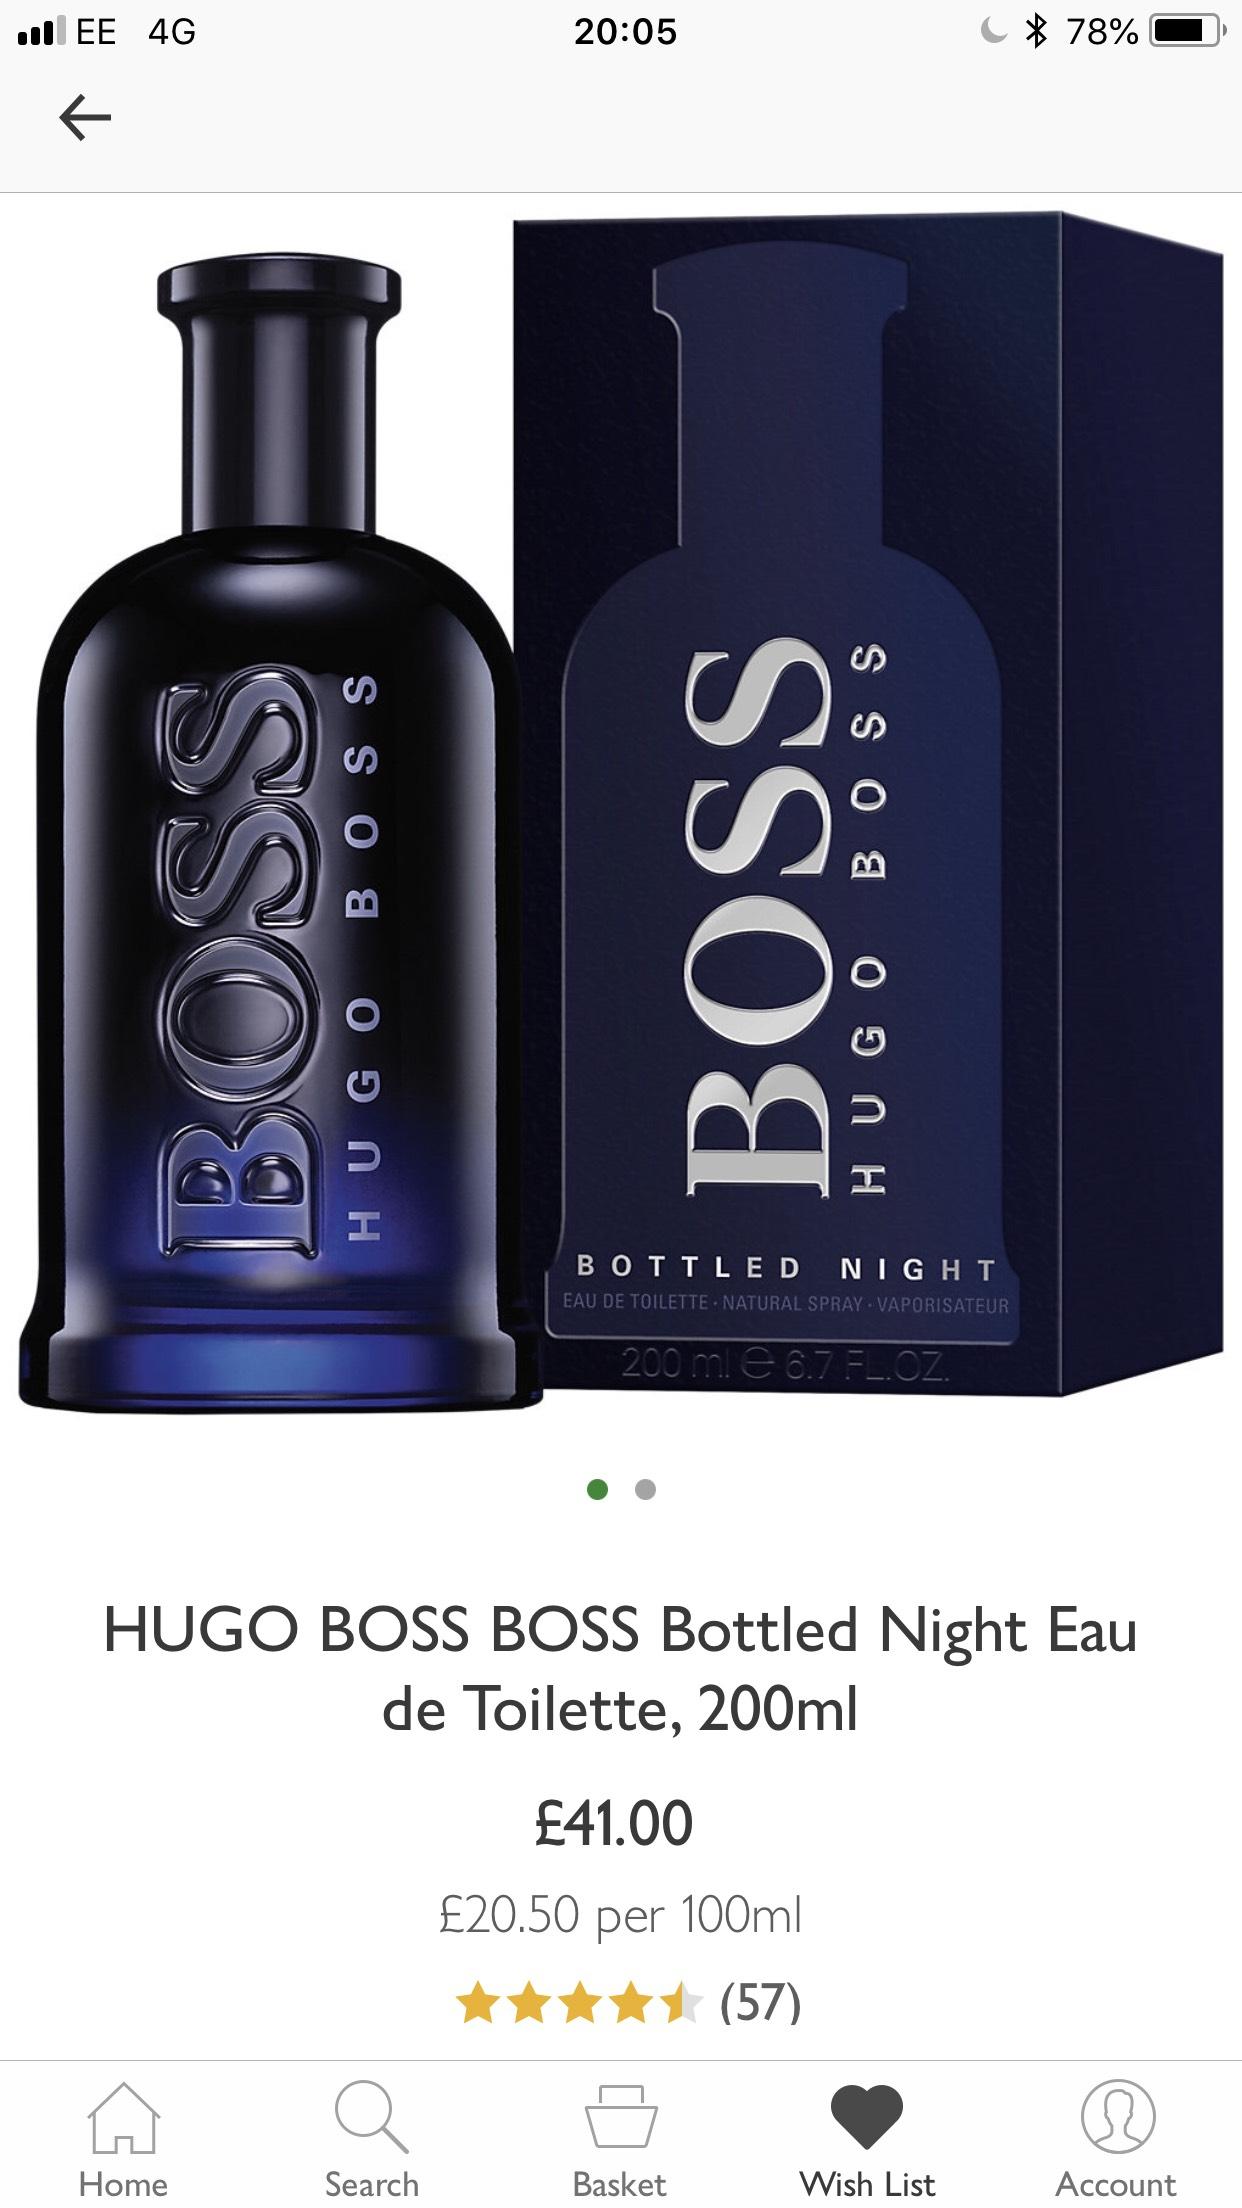 Hugo Boss Bottled Night 200ml - £41 (free C&C) @ John Lewis